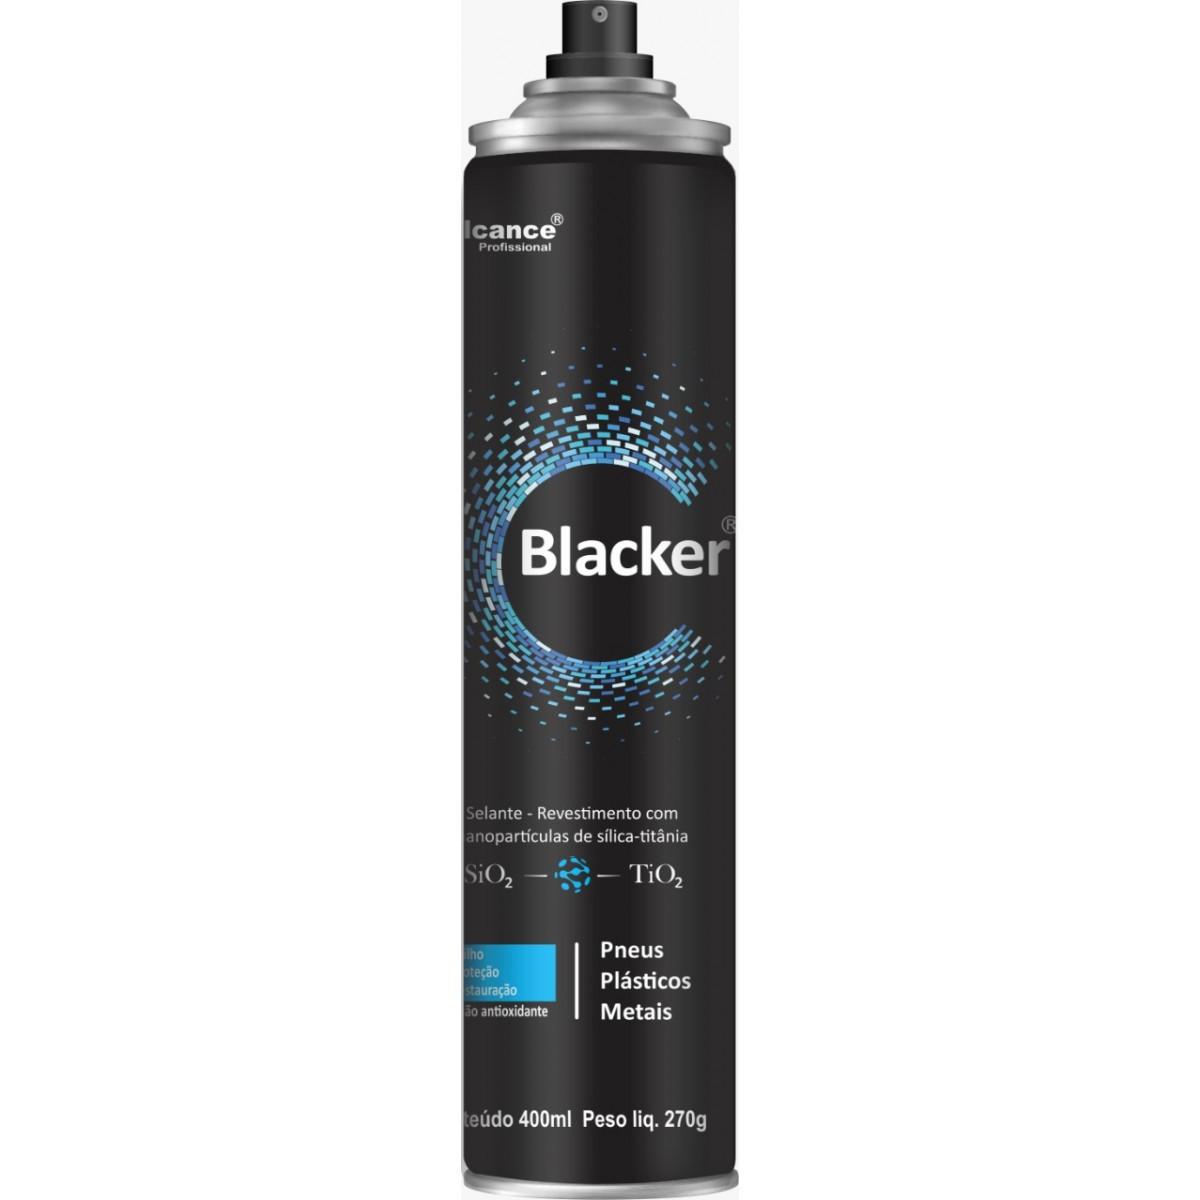 Blacker Selante - Revestimento para Pneus, Plásticos e Metais - Alcance - 400ml